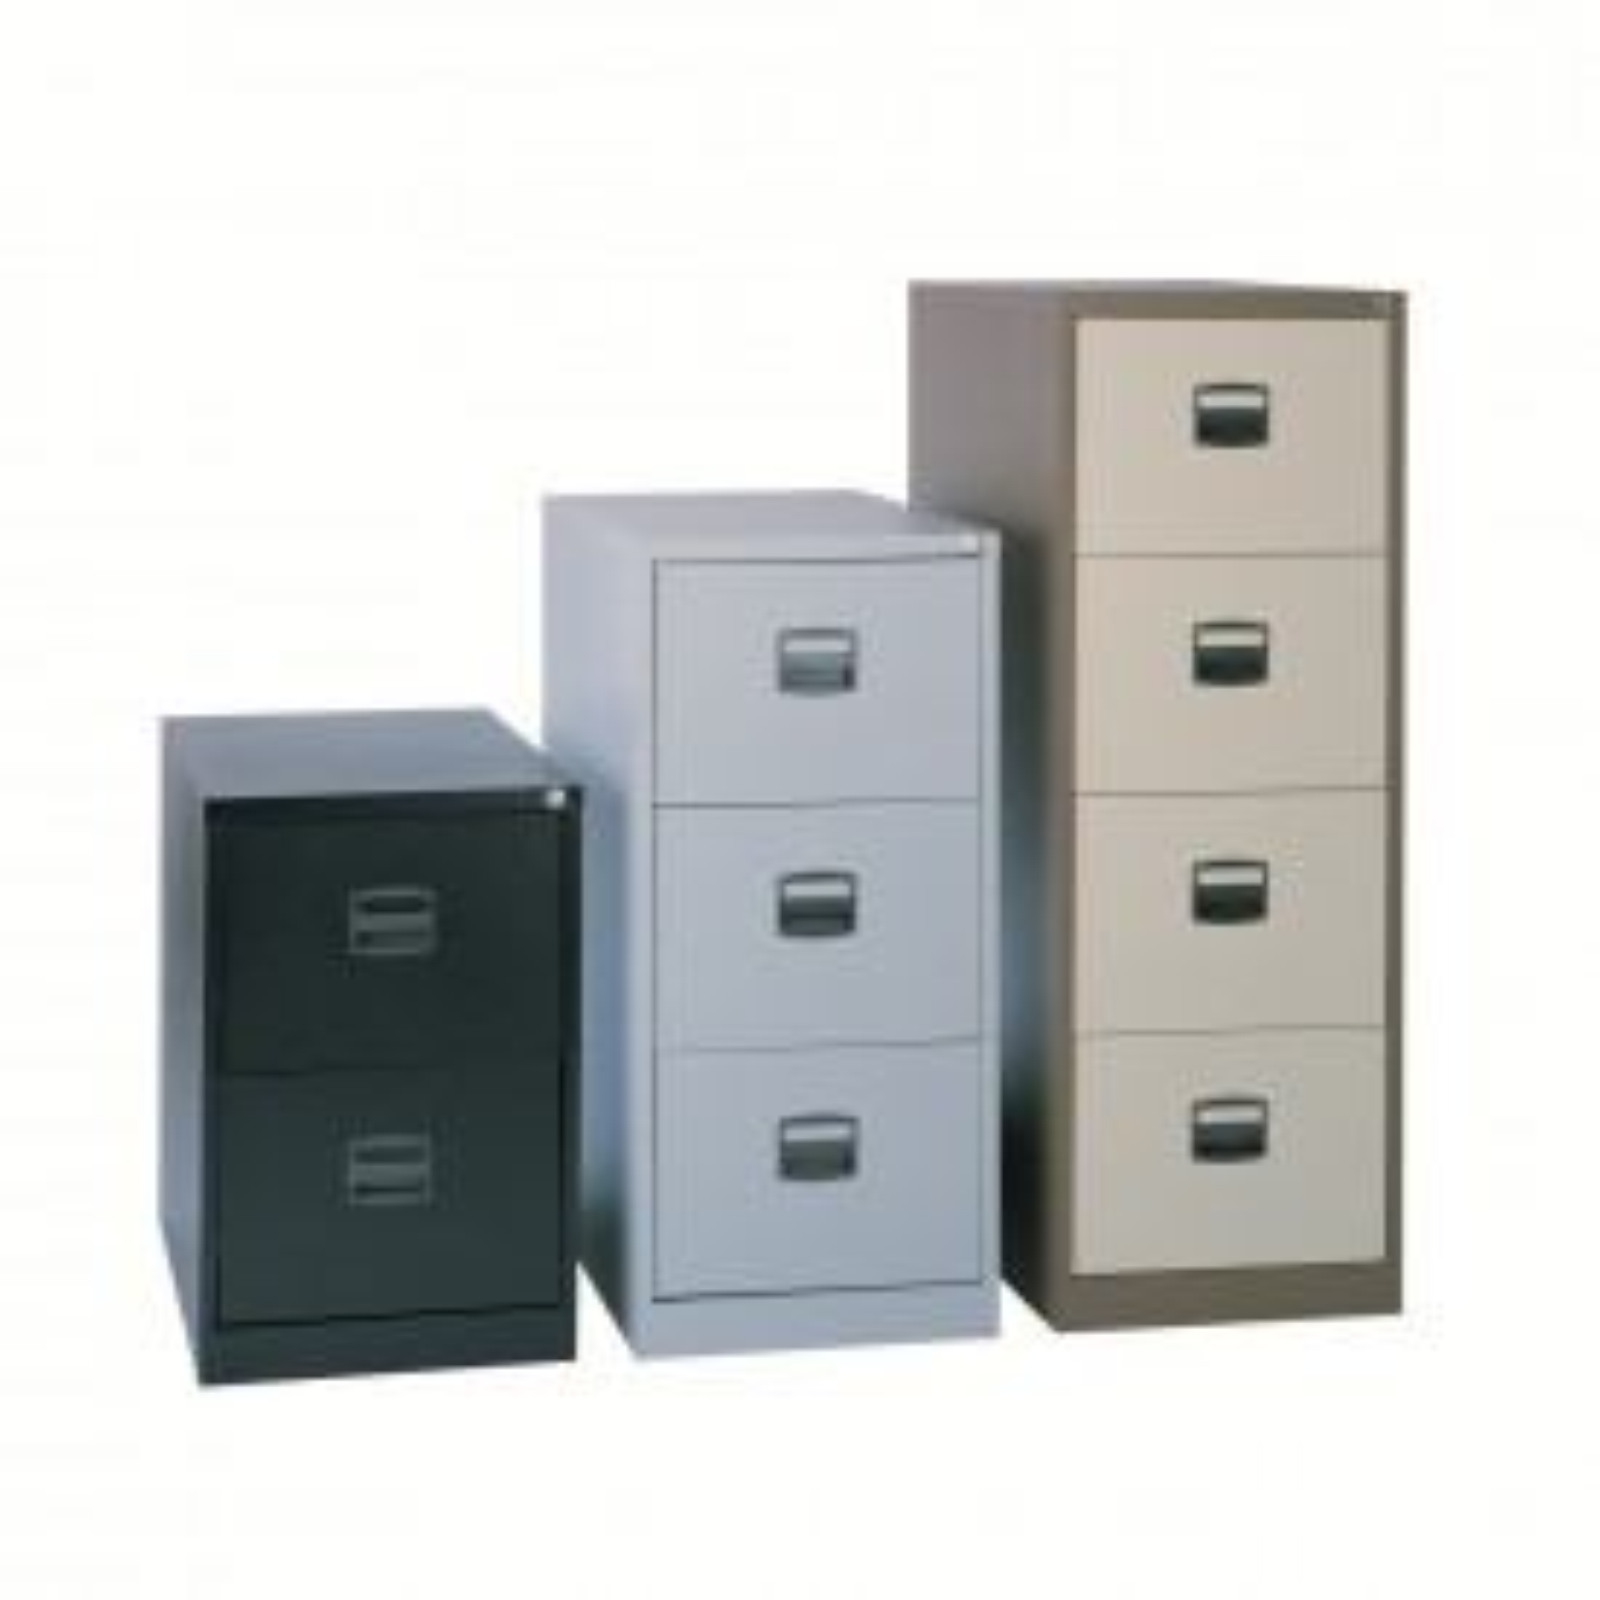 BIG DEAL Bisley Contact Filing Cabinet 3 Pack Offer